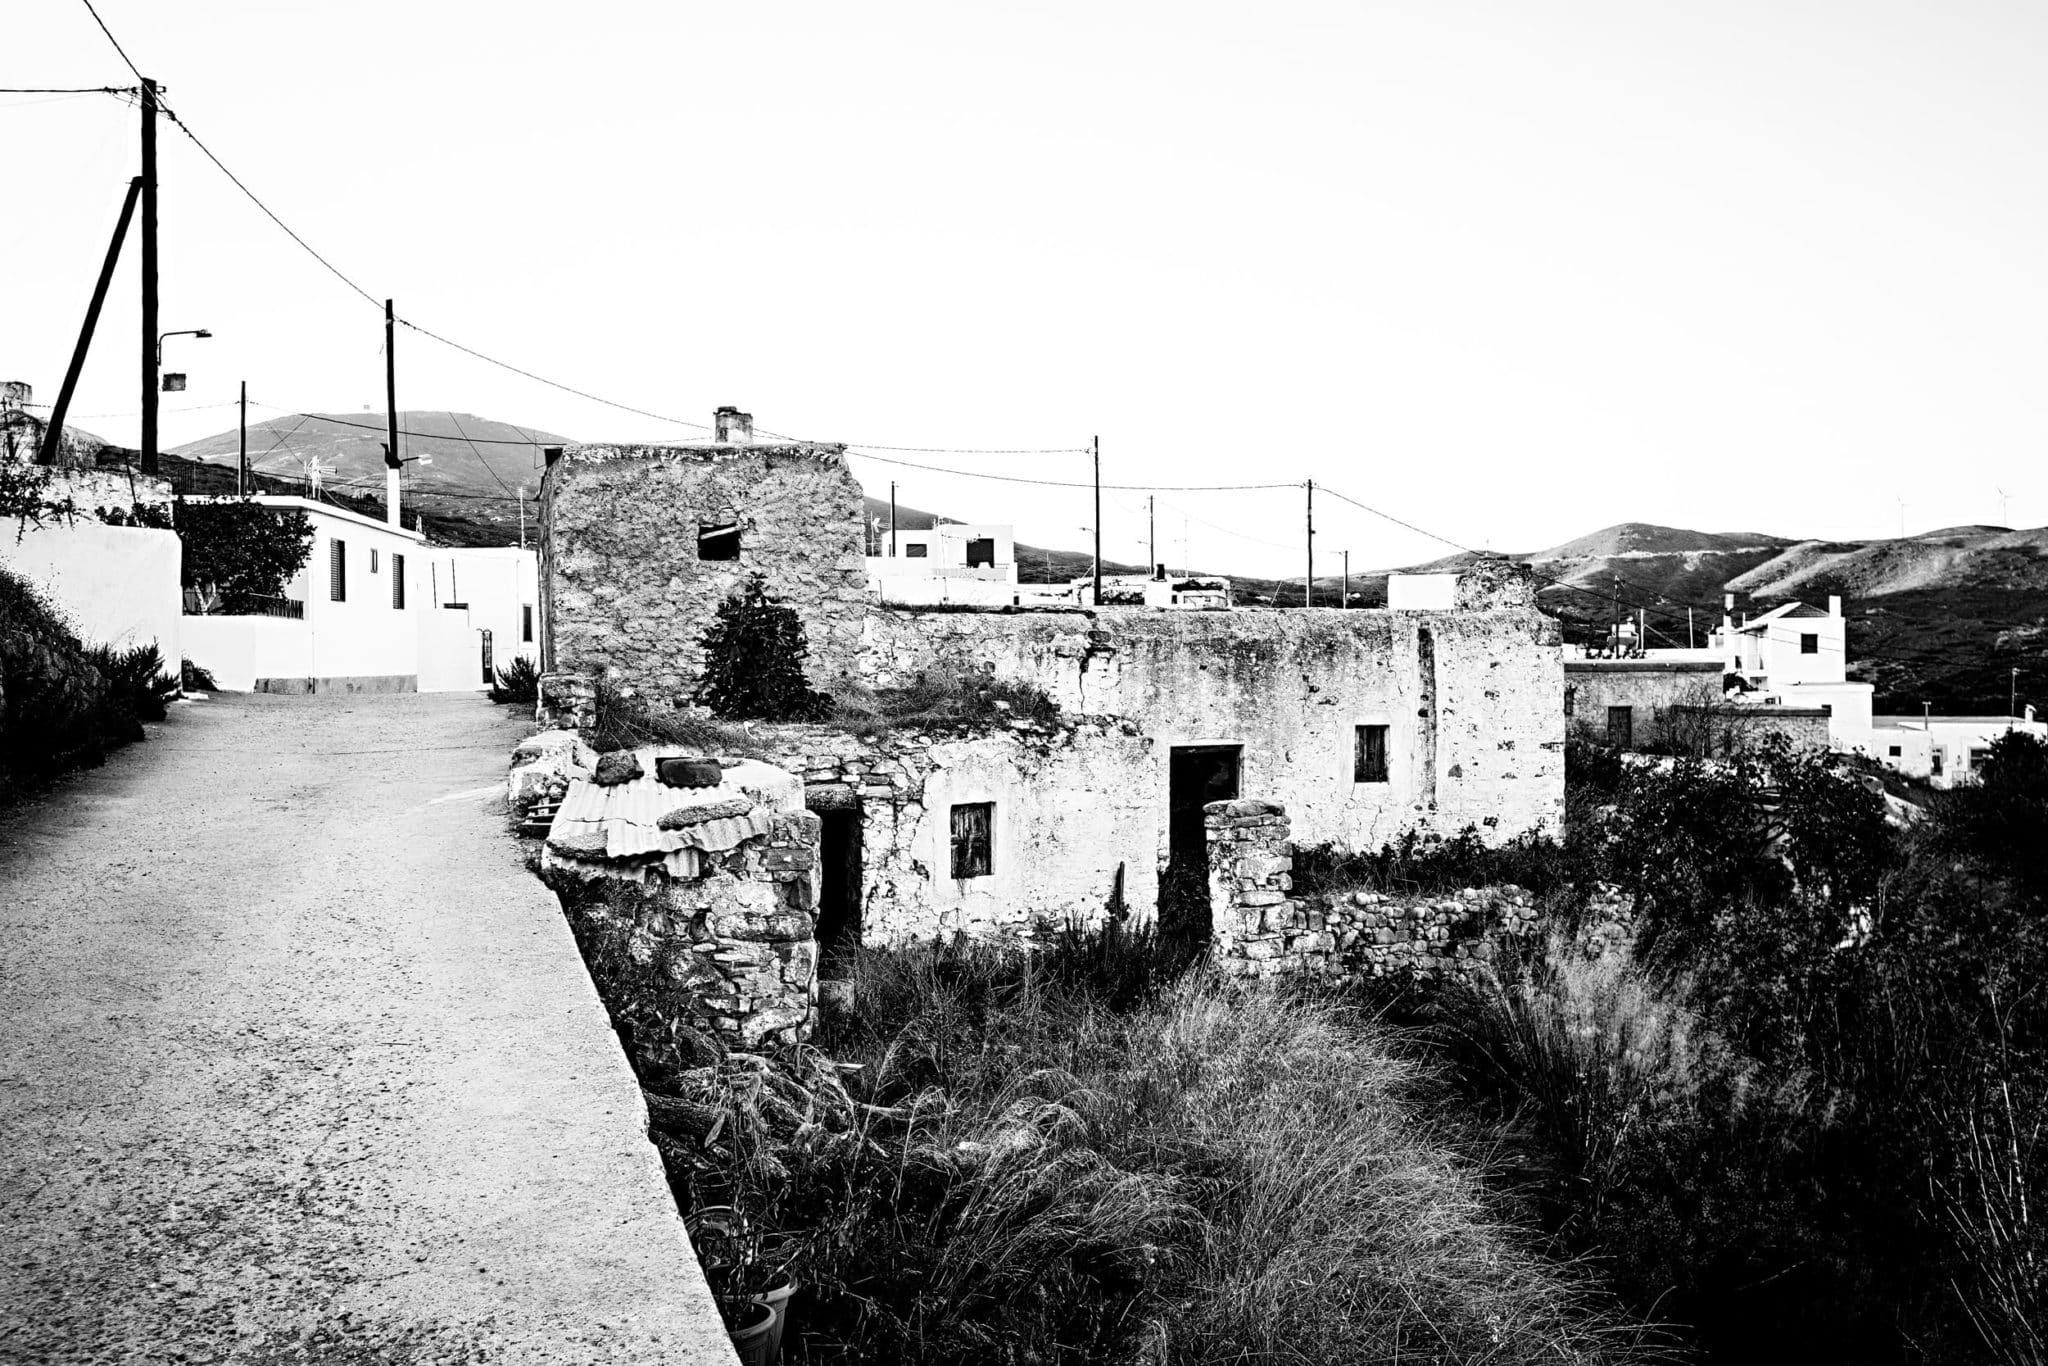 Mesanagros Rhodes